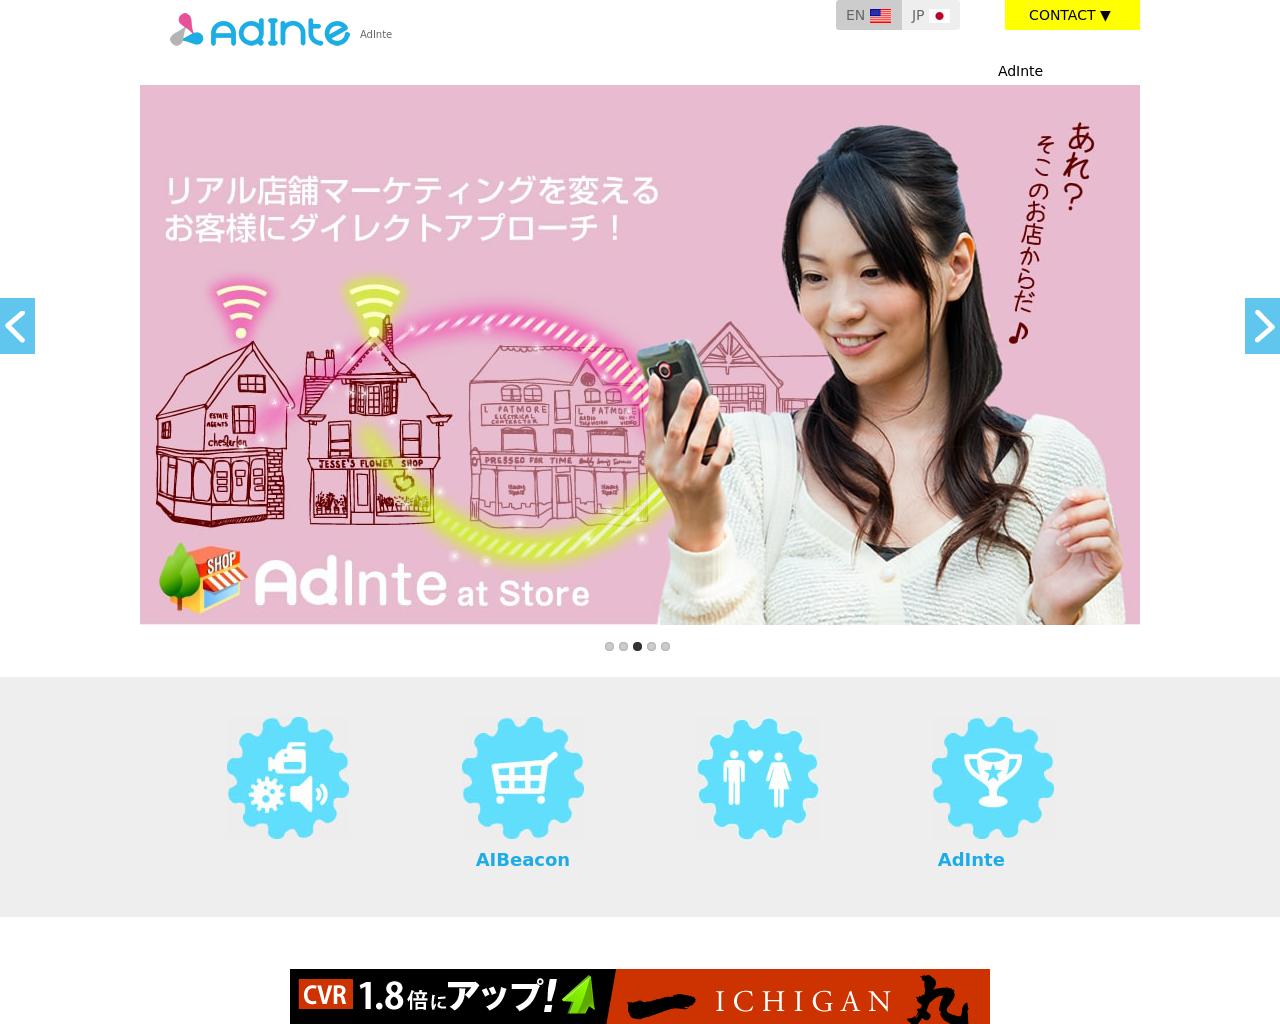 AdInte-Advertising-Reviews-Pricing